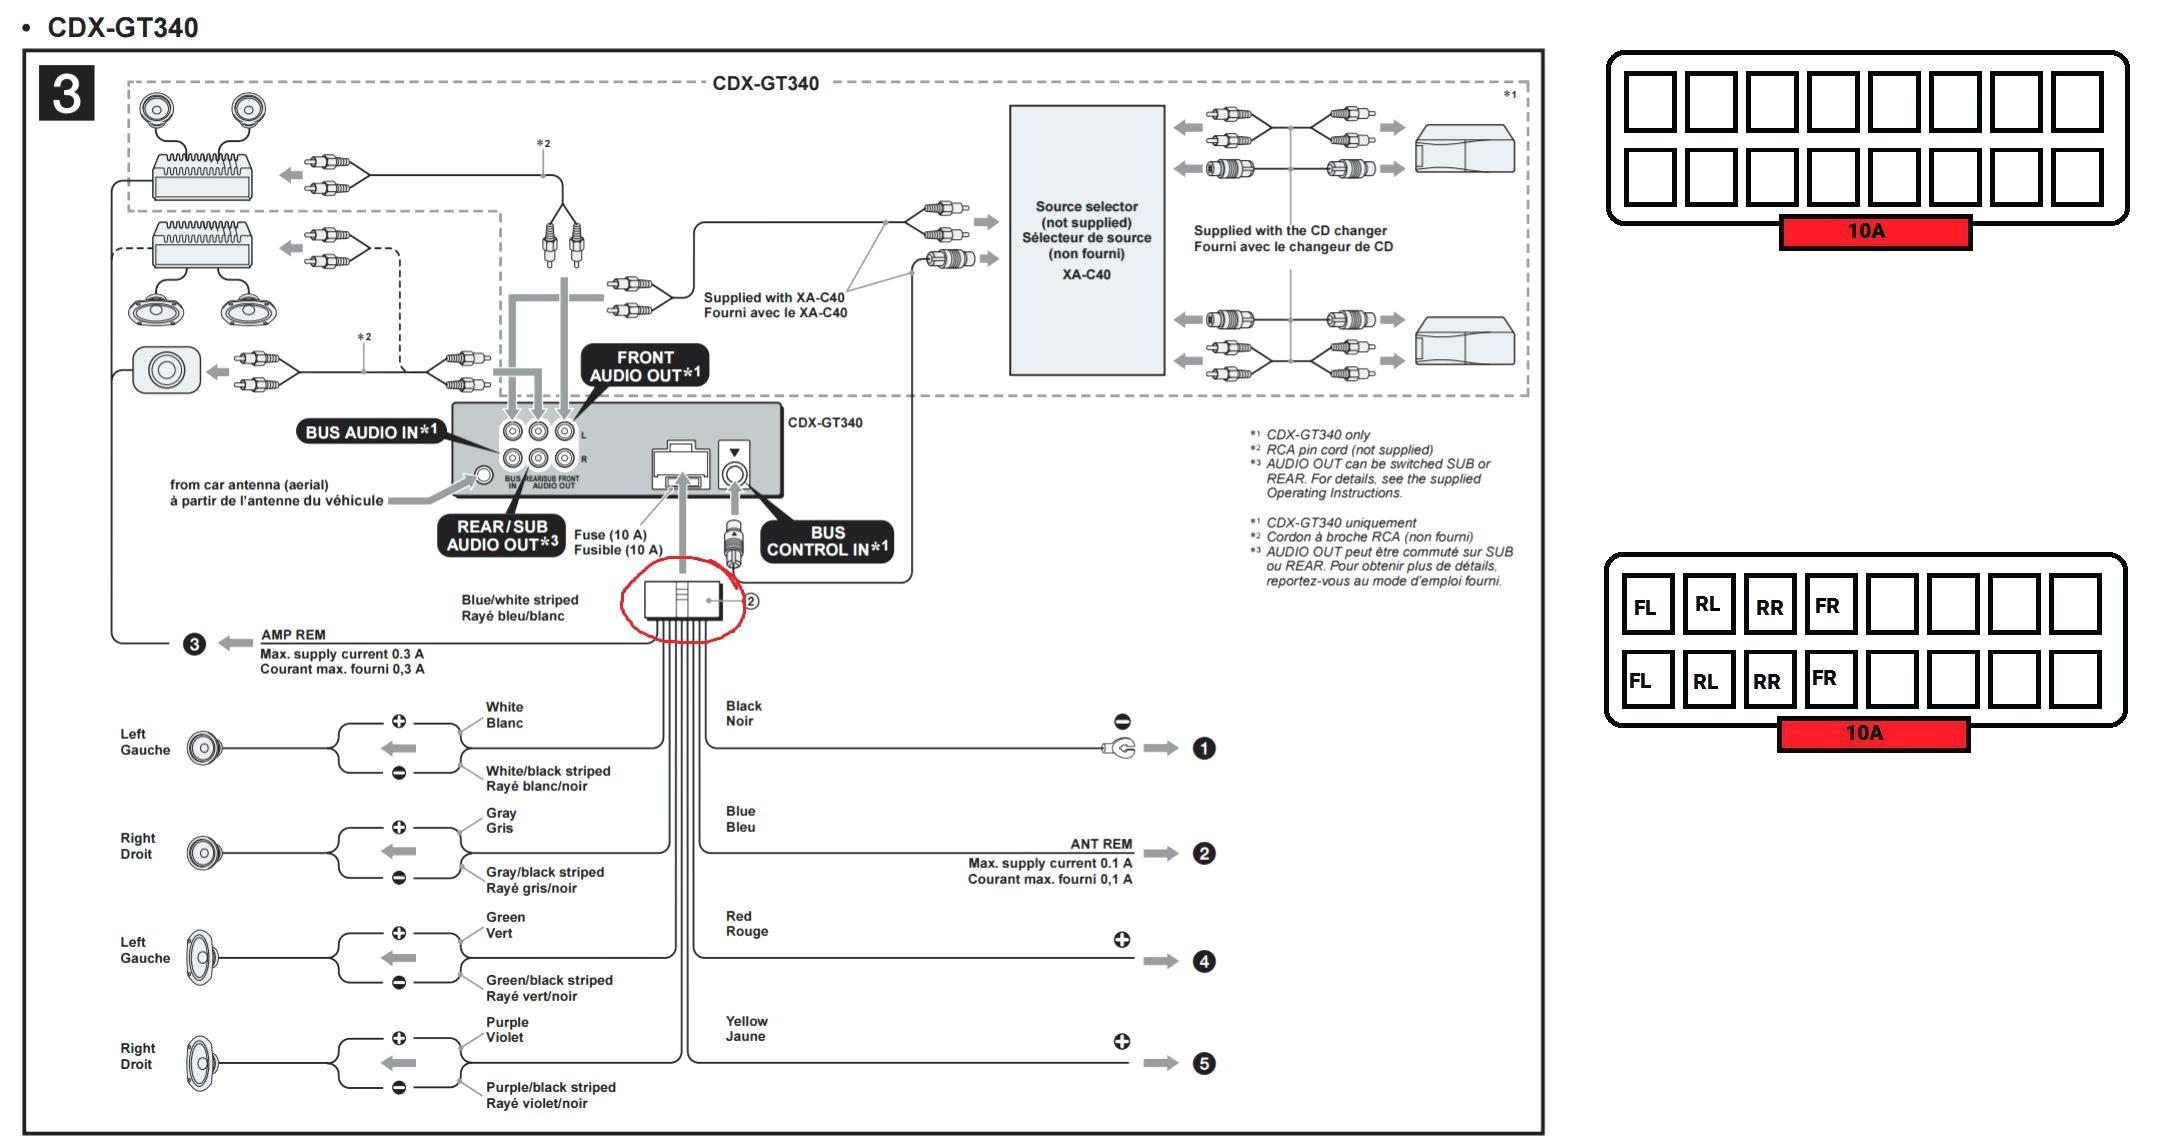 sony cdx gt340 wiring diagram